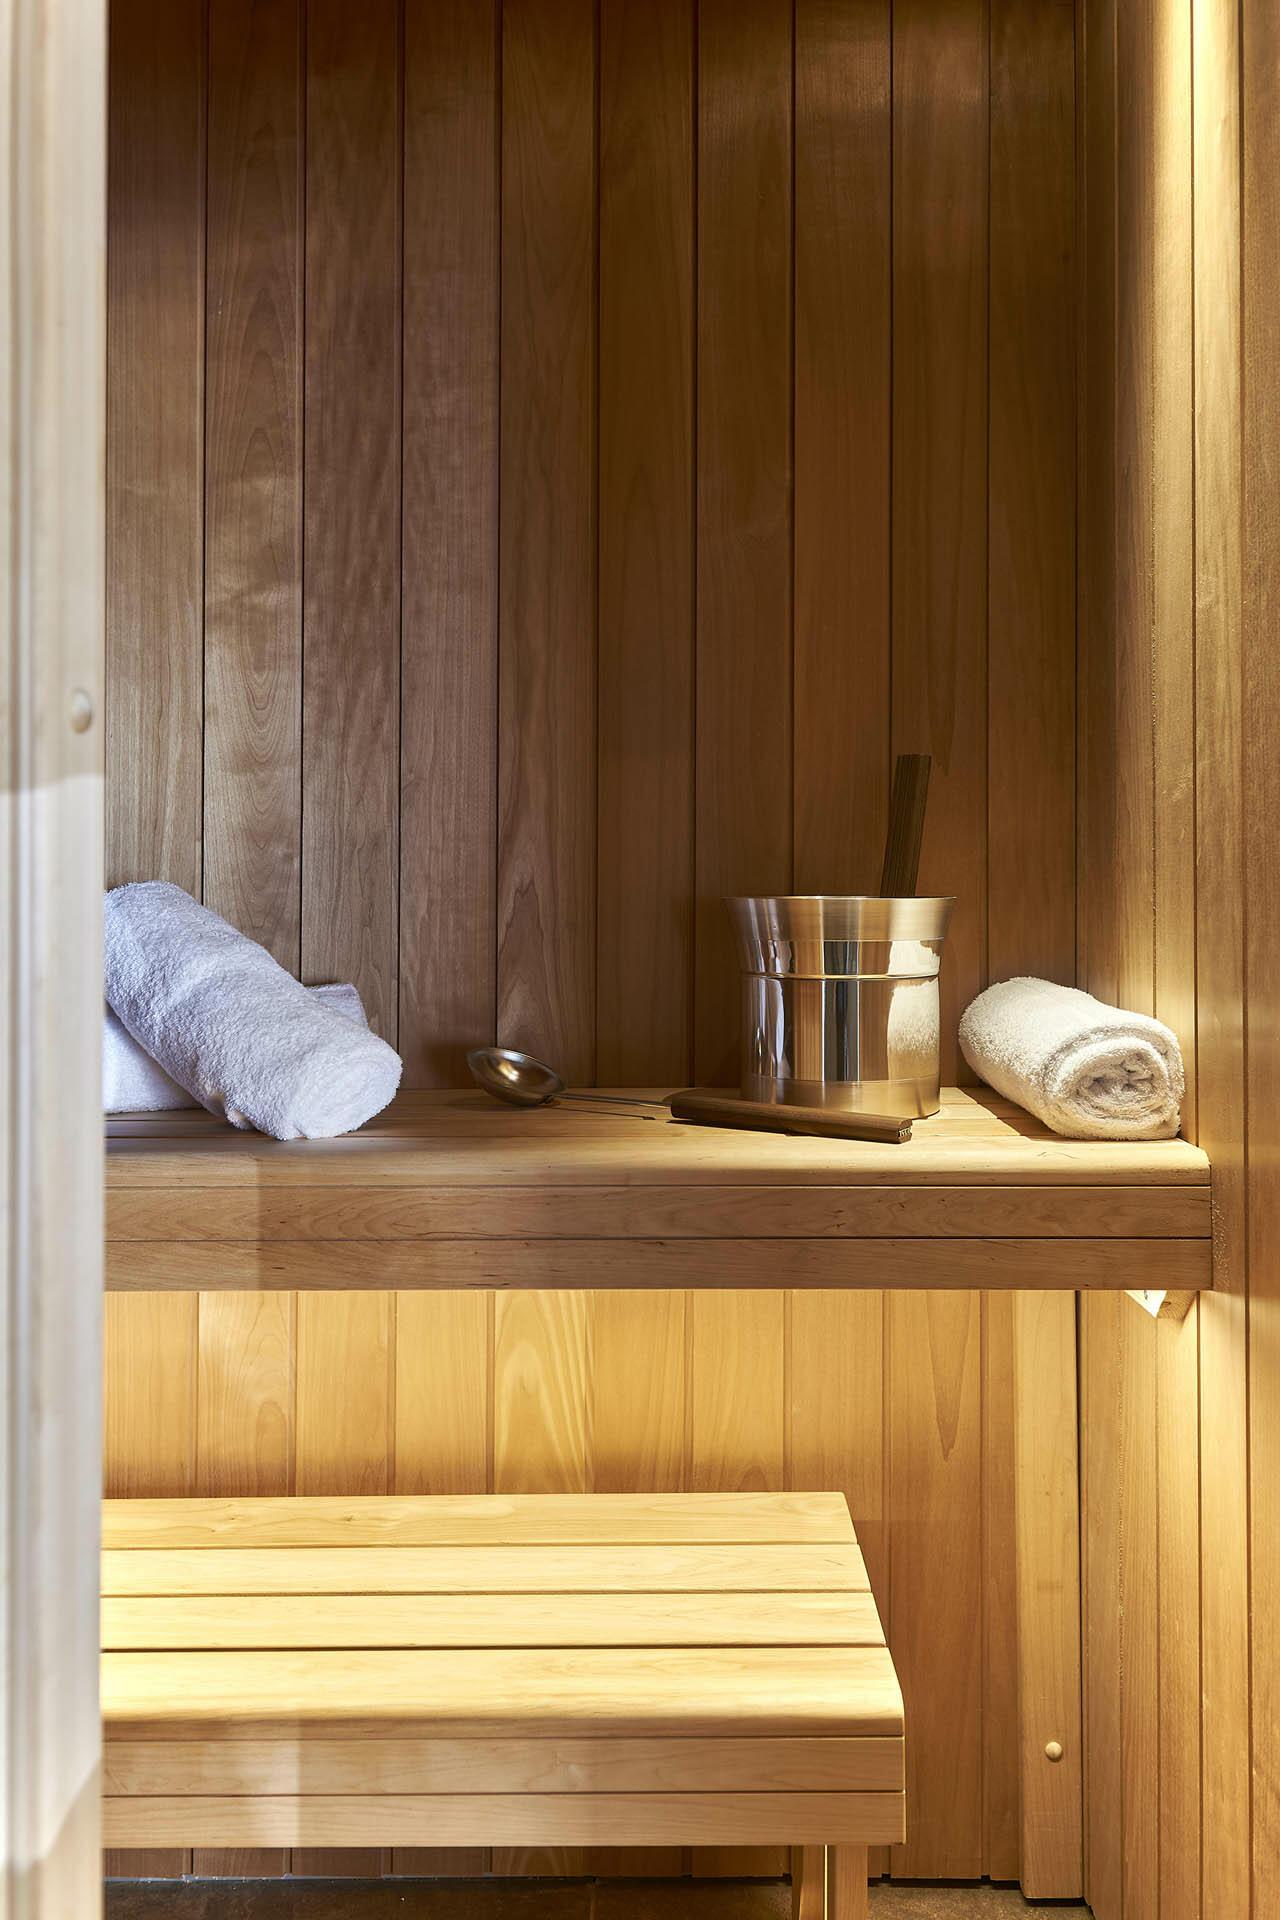 Sauna at Splendid Hotel and Spa